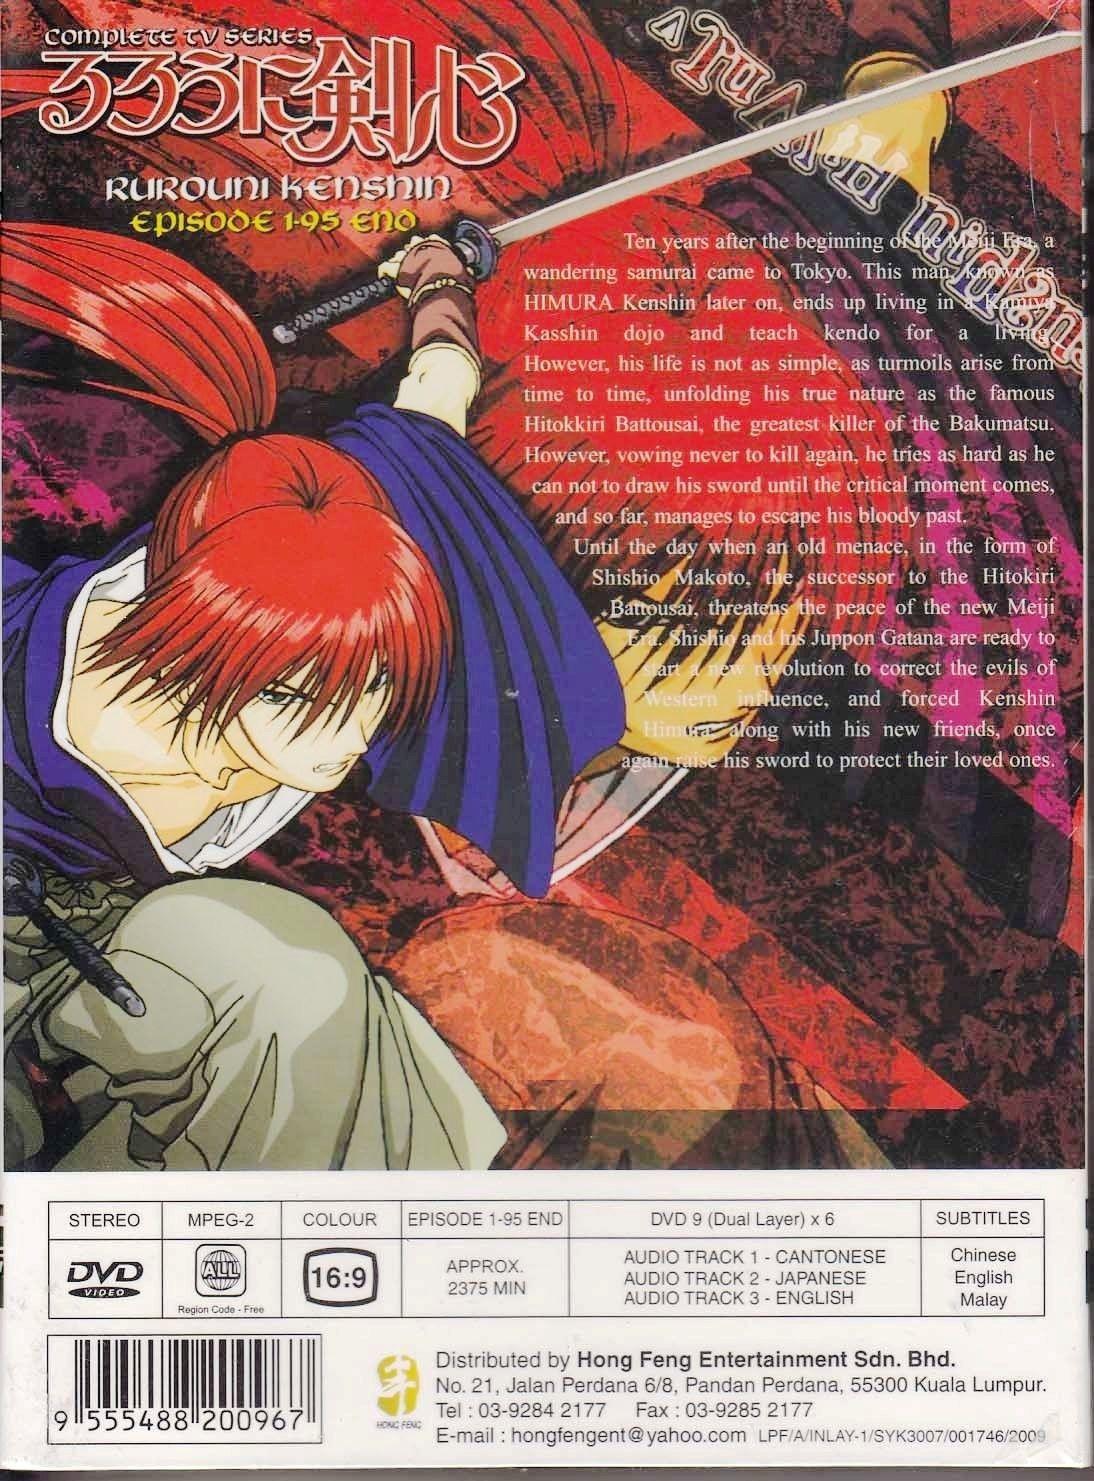 Rurouni Kenshin Komplet Serie English